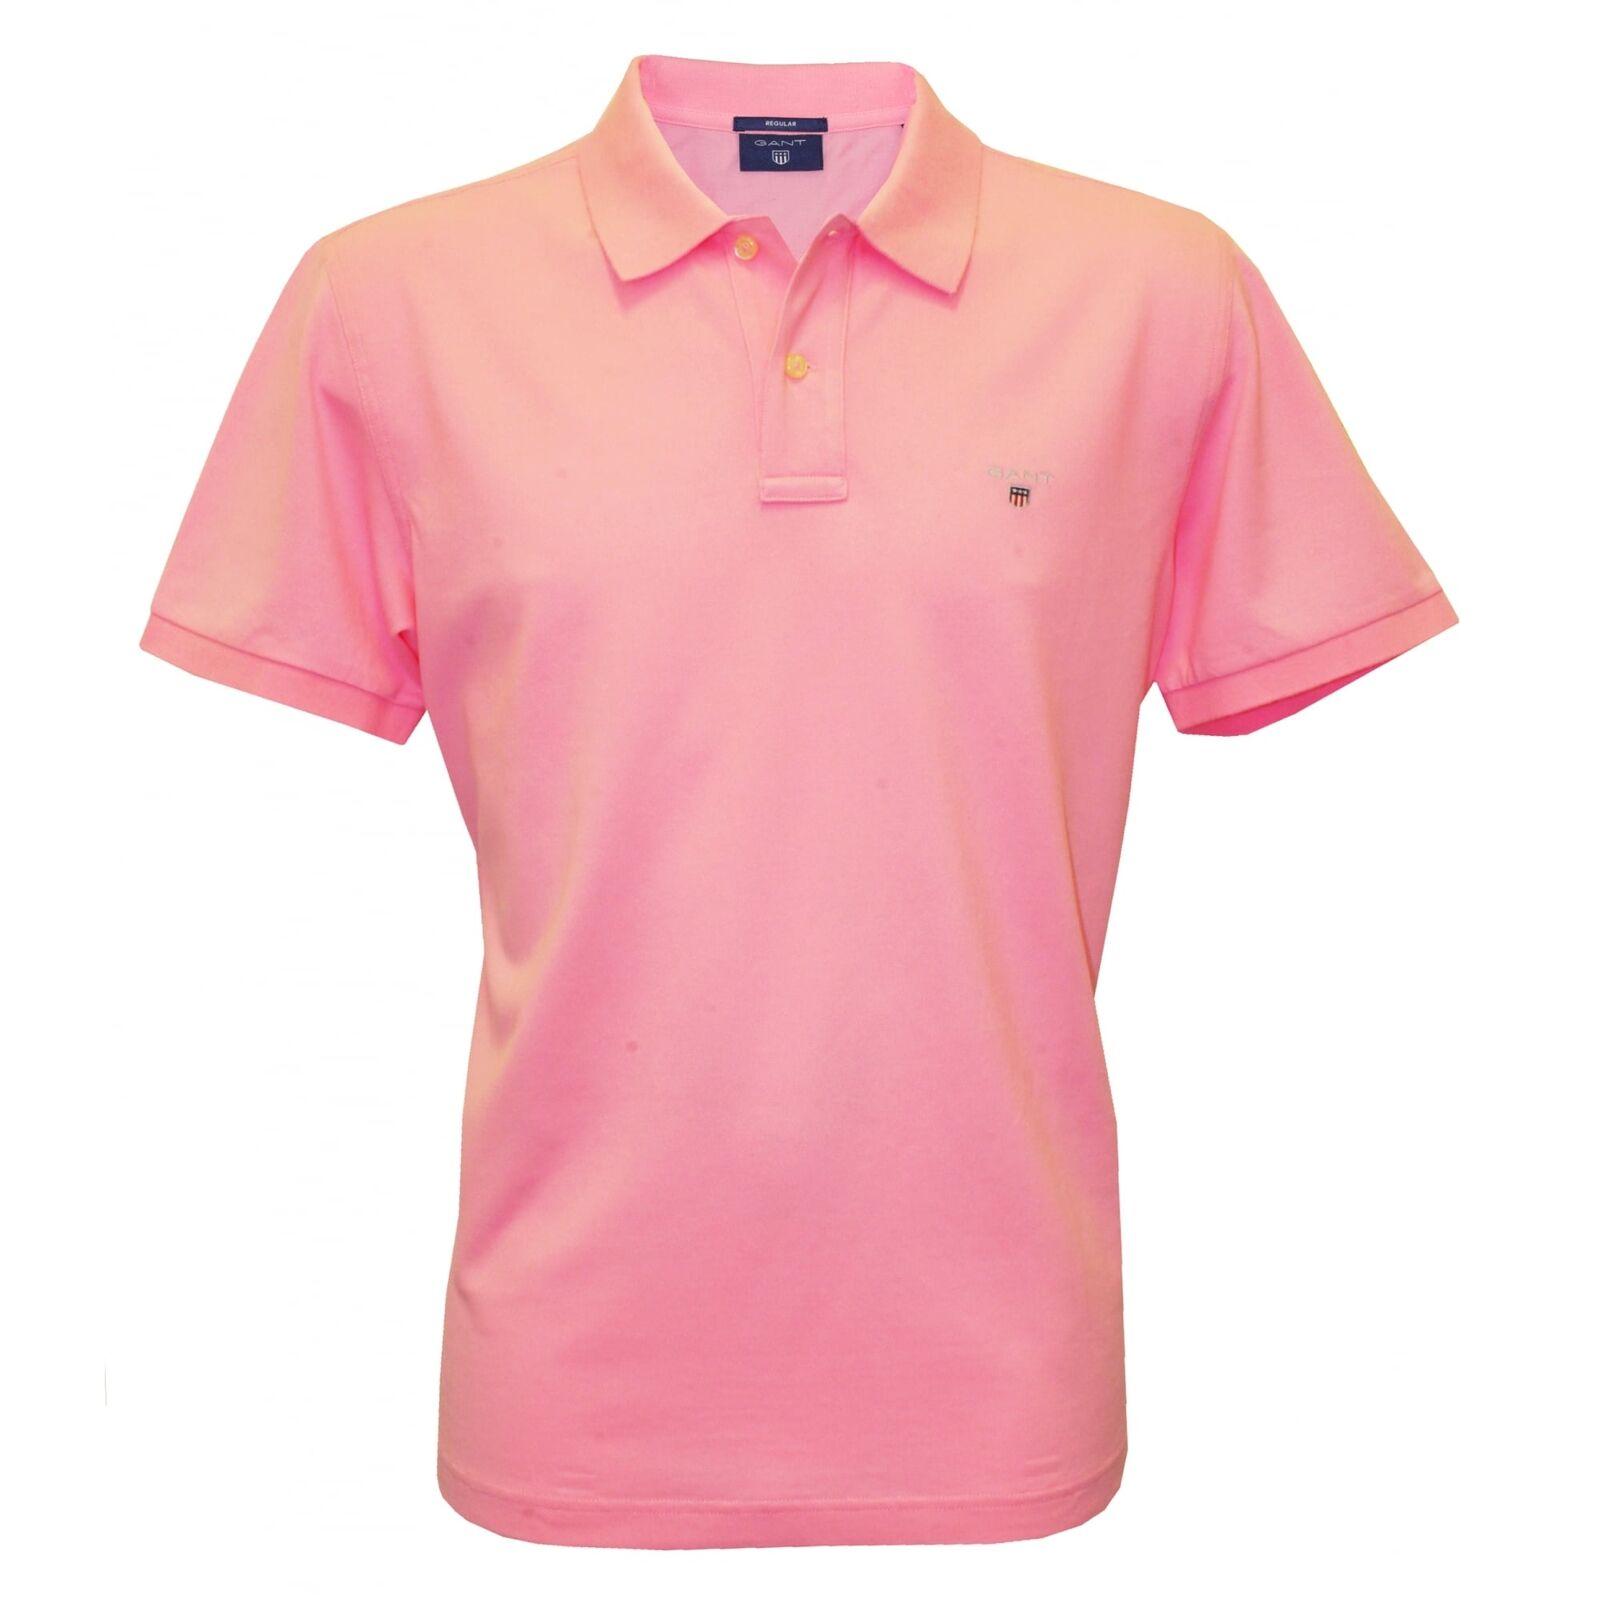 Gant Solid Pique Men's Polo Shirt, Soft pink